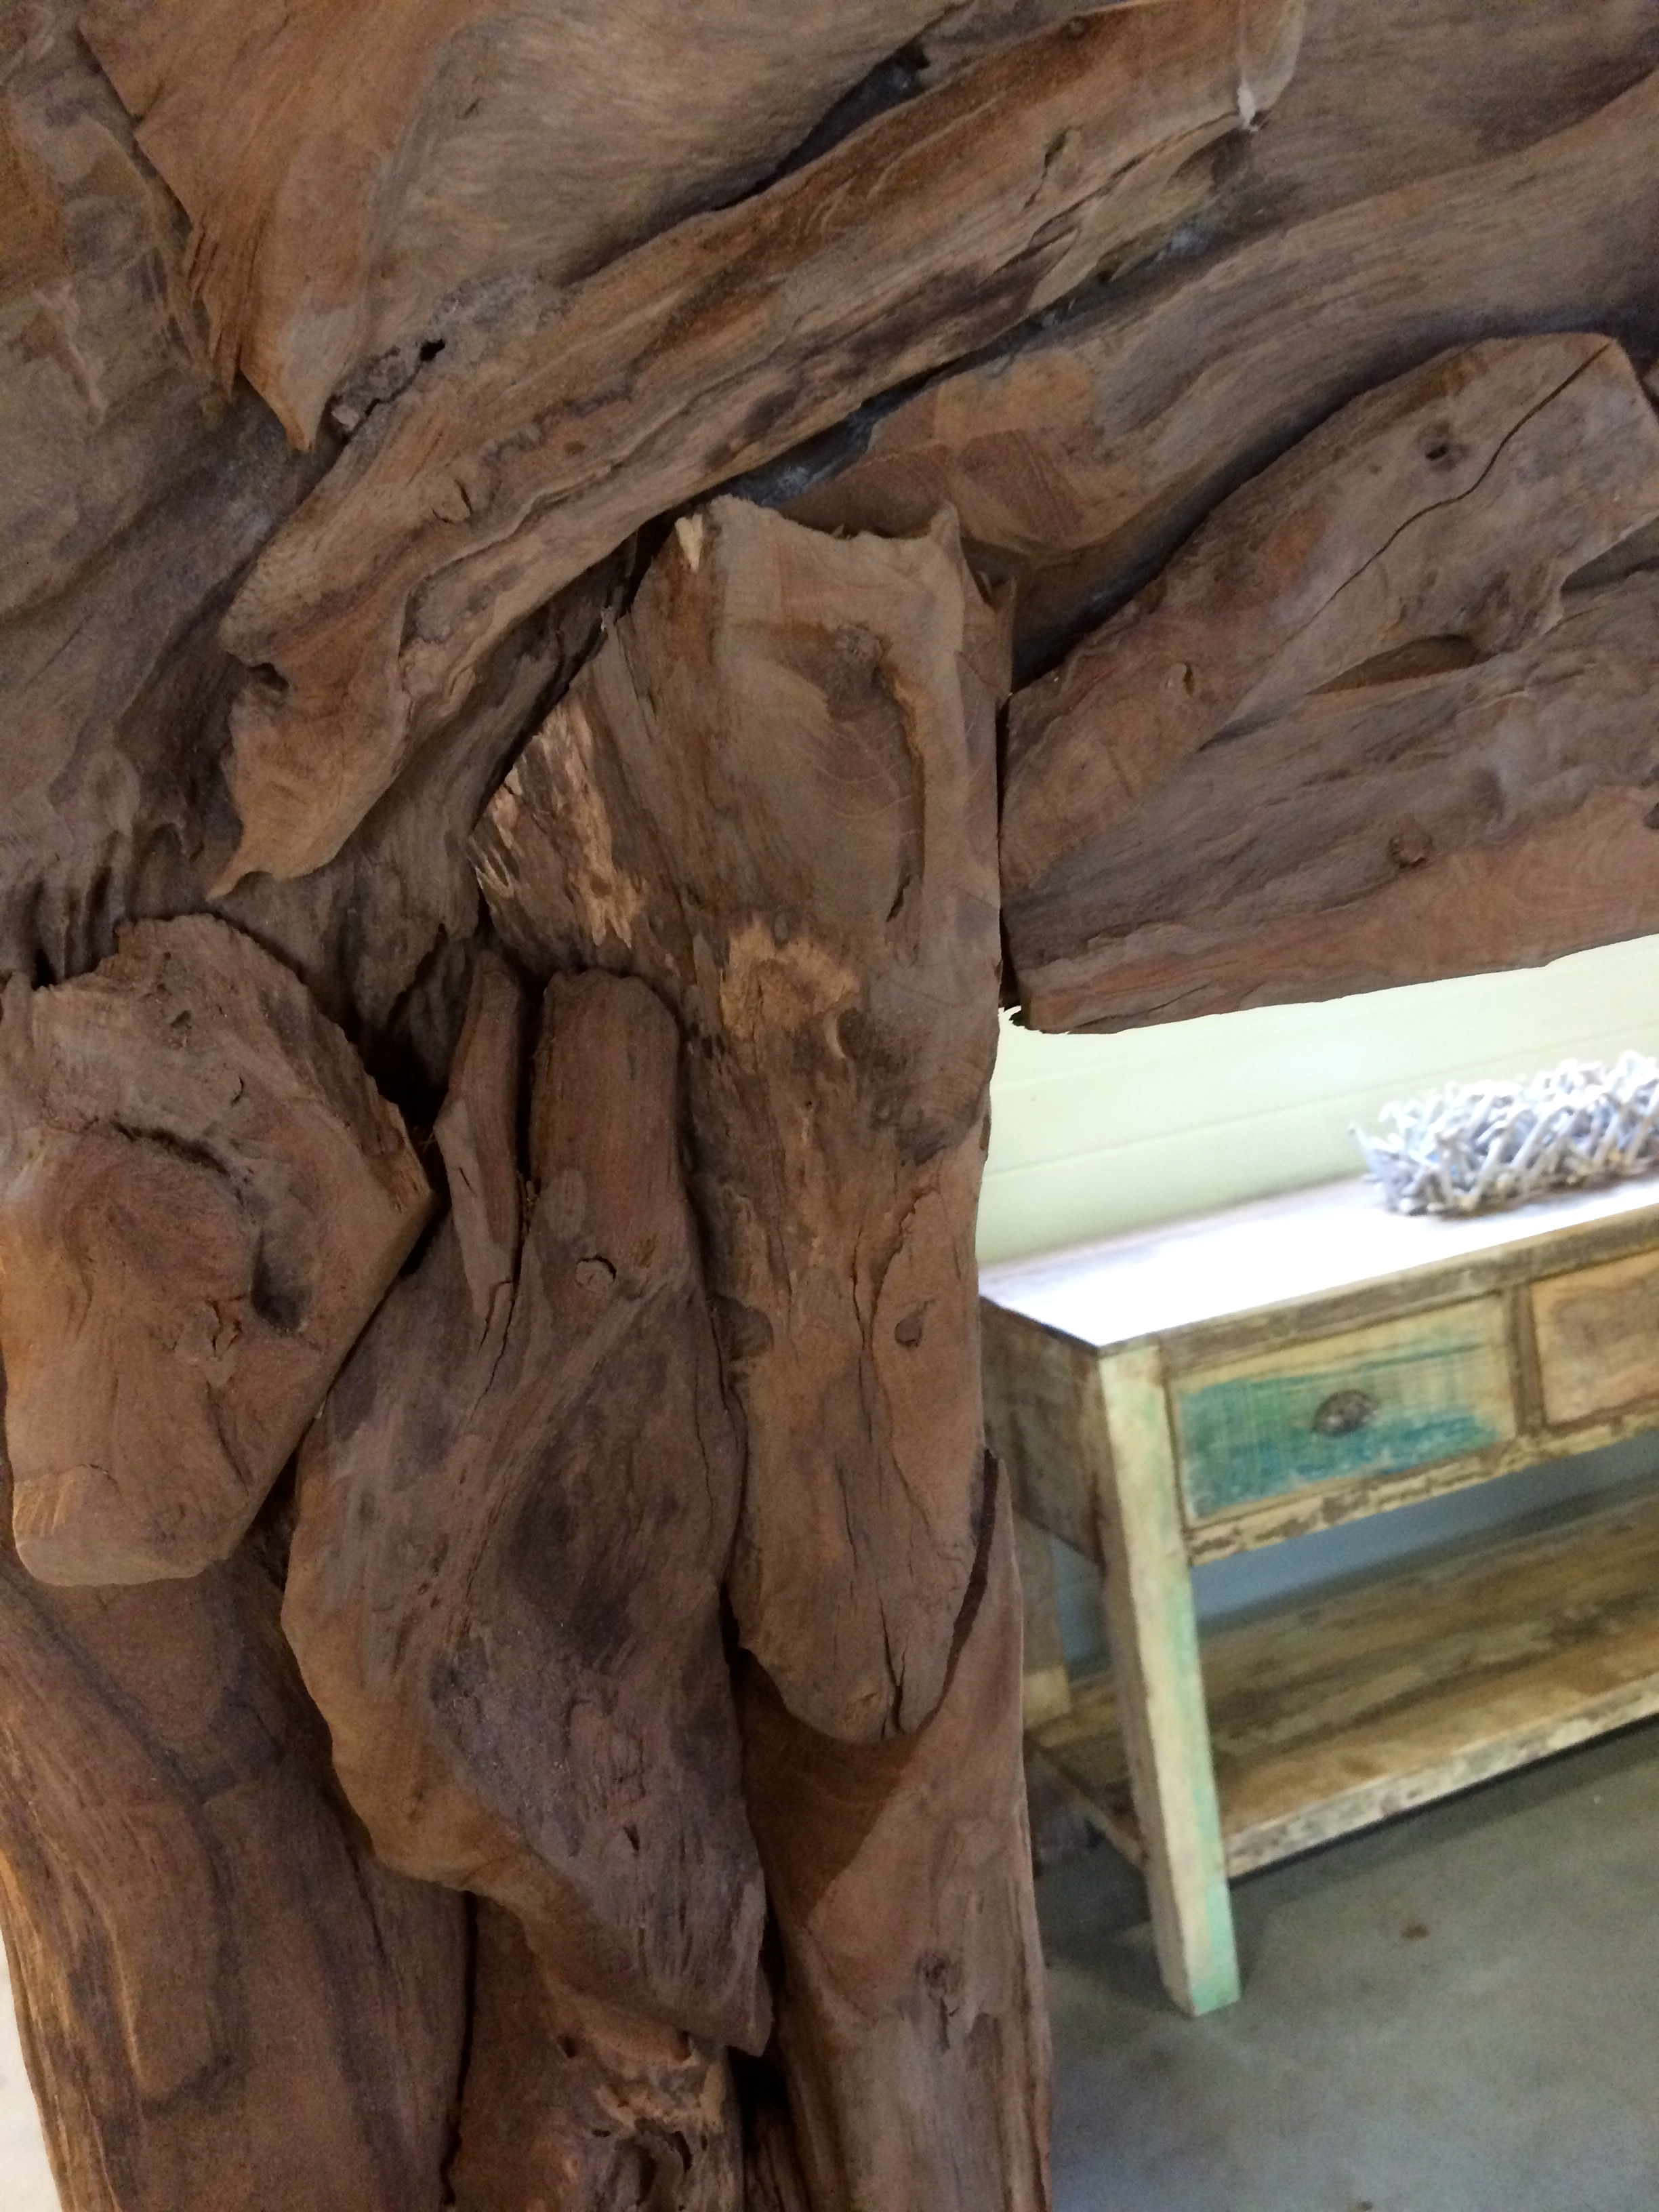 Spiegels drijfhout    root   Polder TEAK